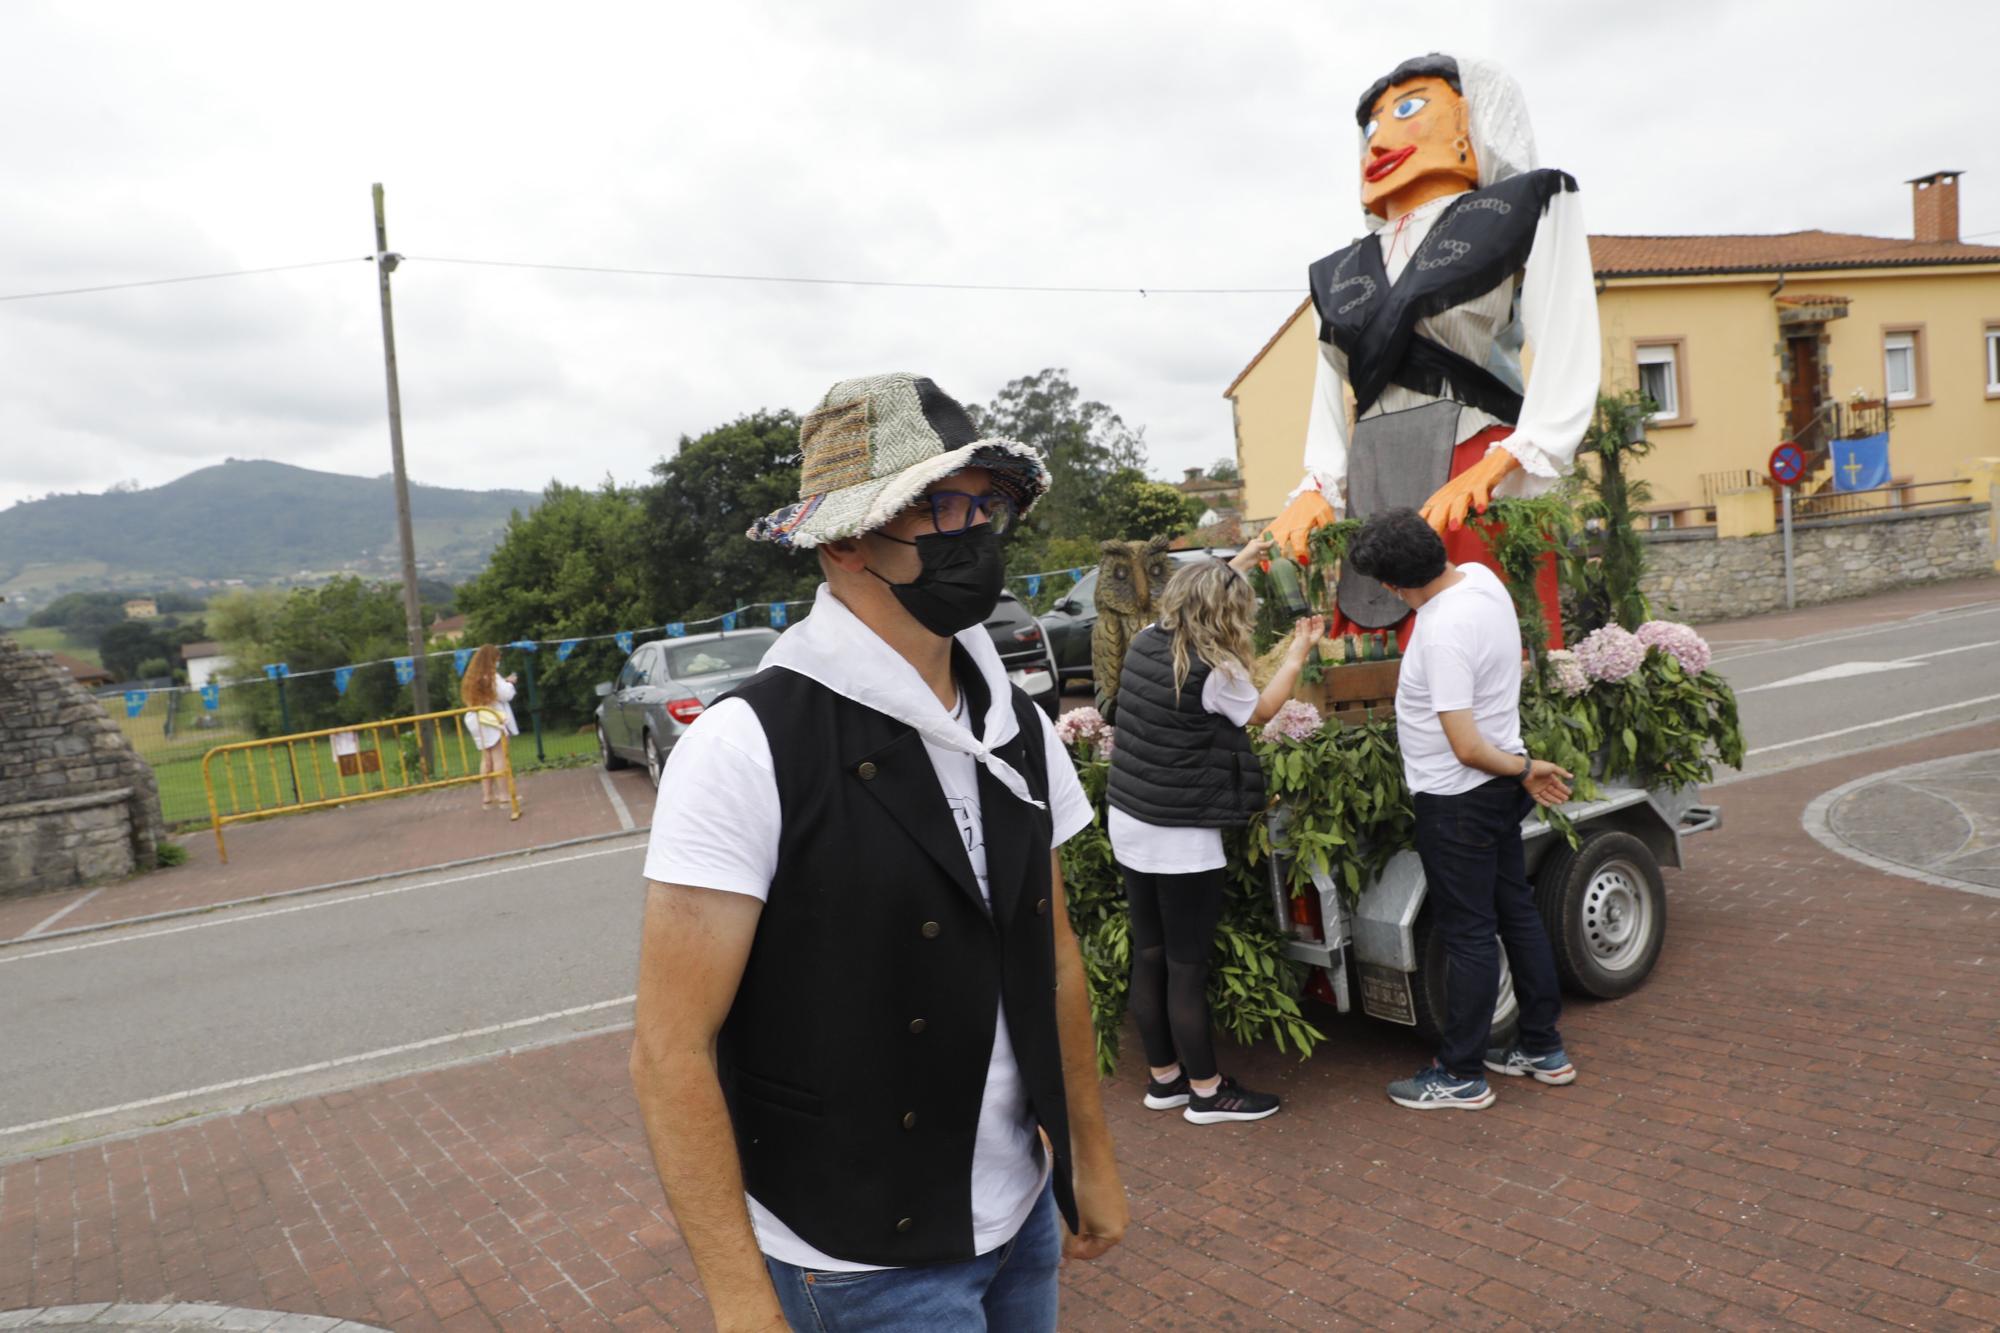 Fiestas en Granda